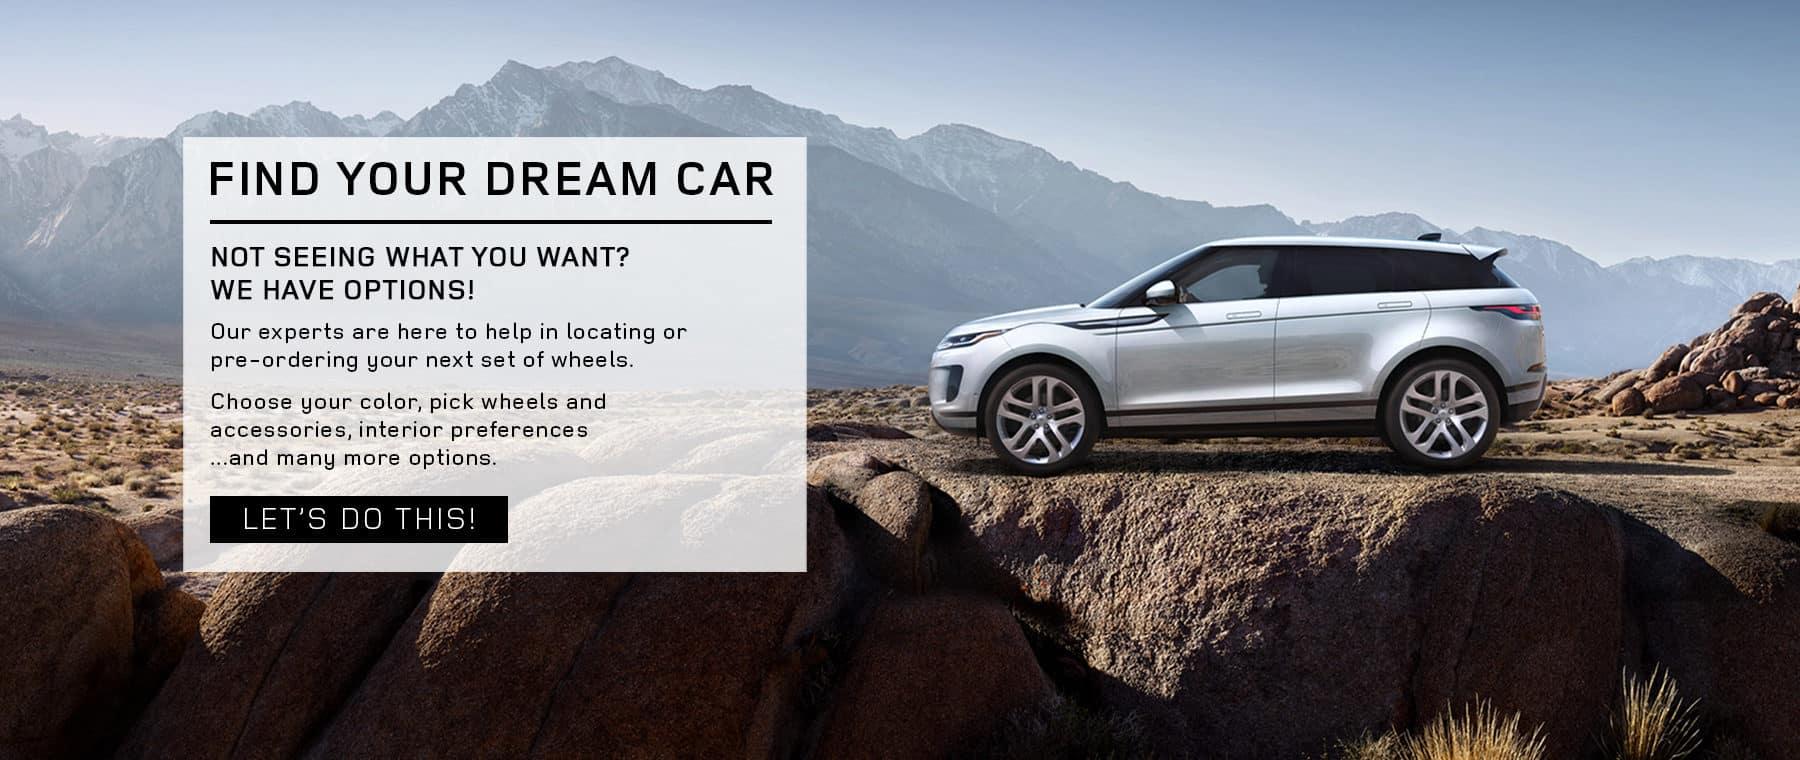 Holman Land Rover Denver Pre-Order Dream Car